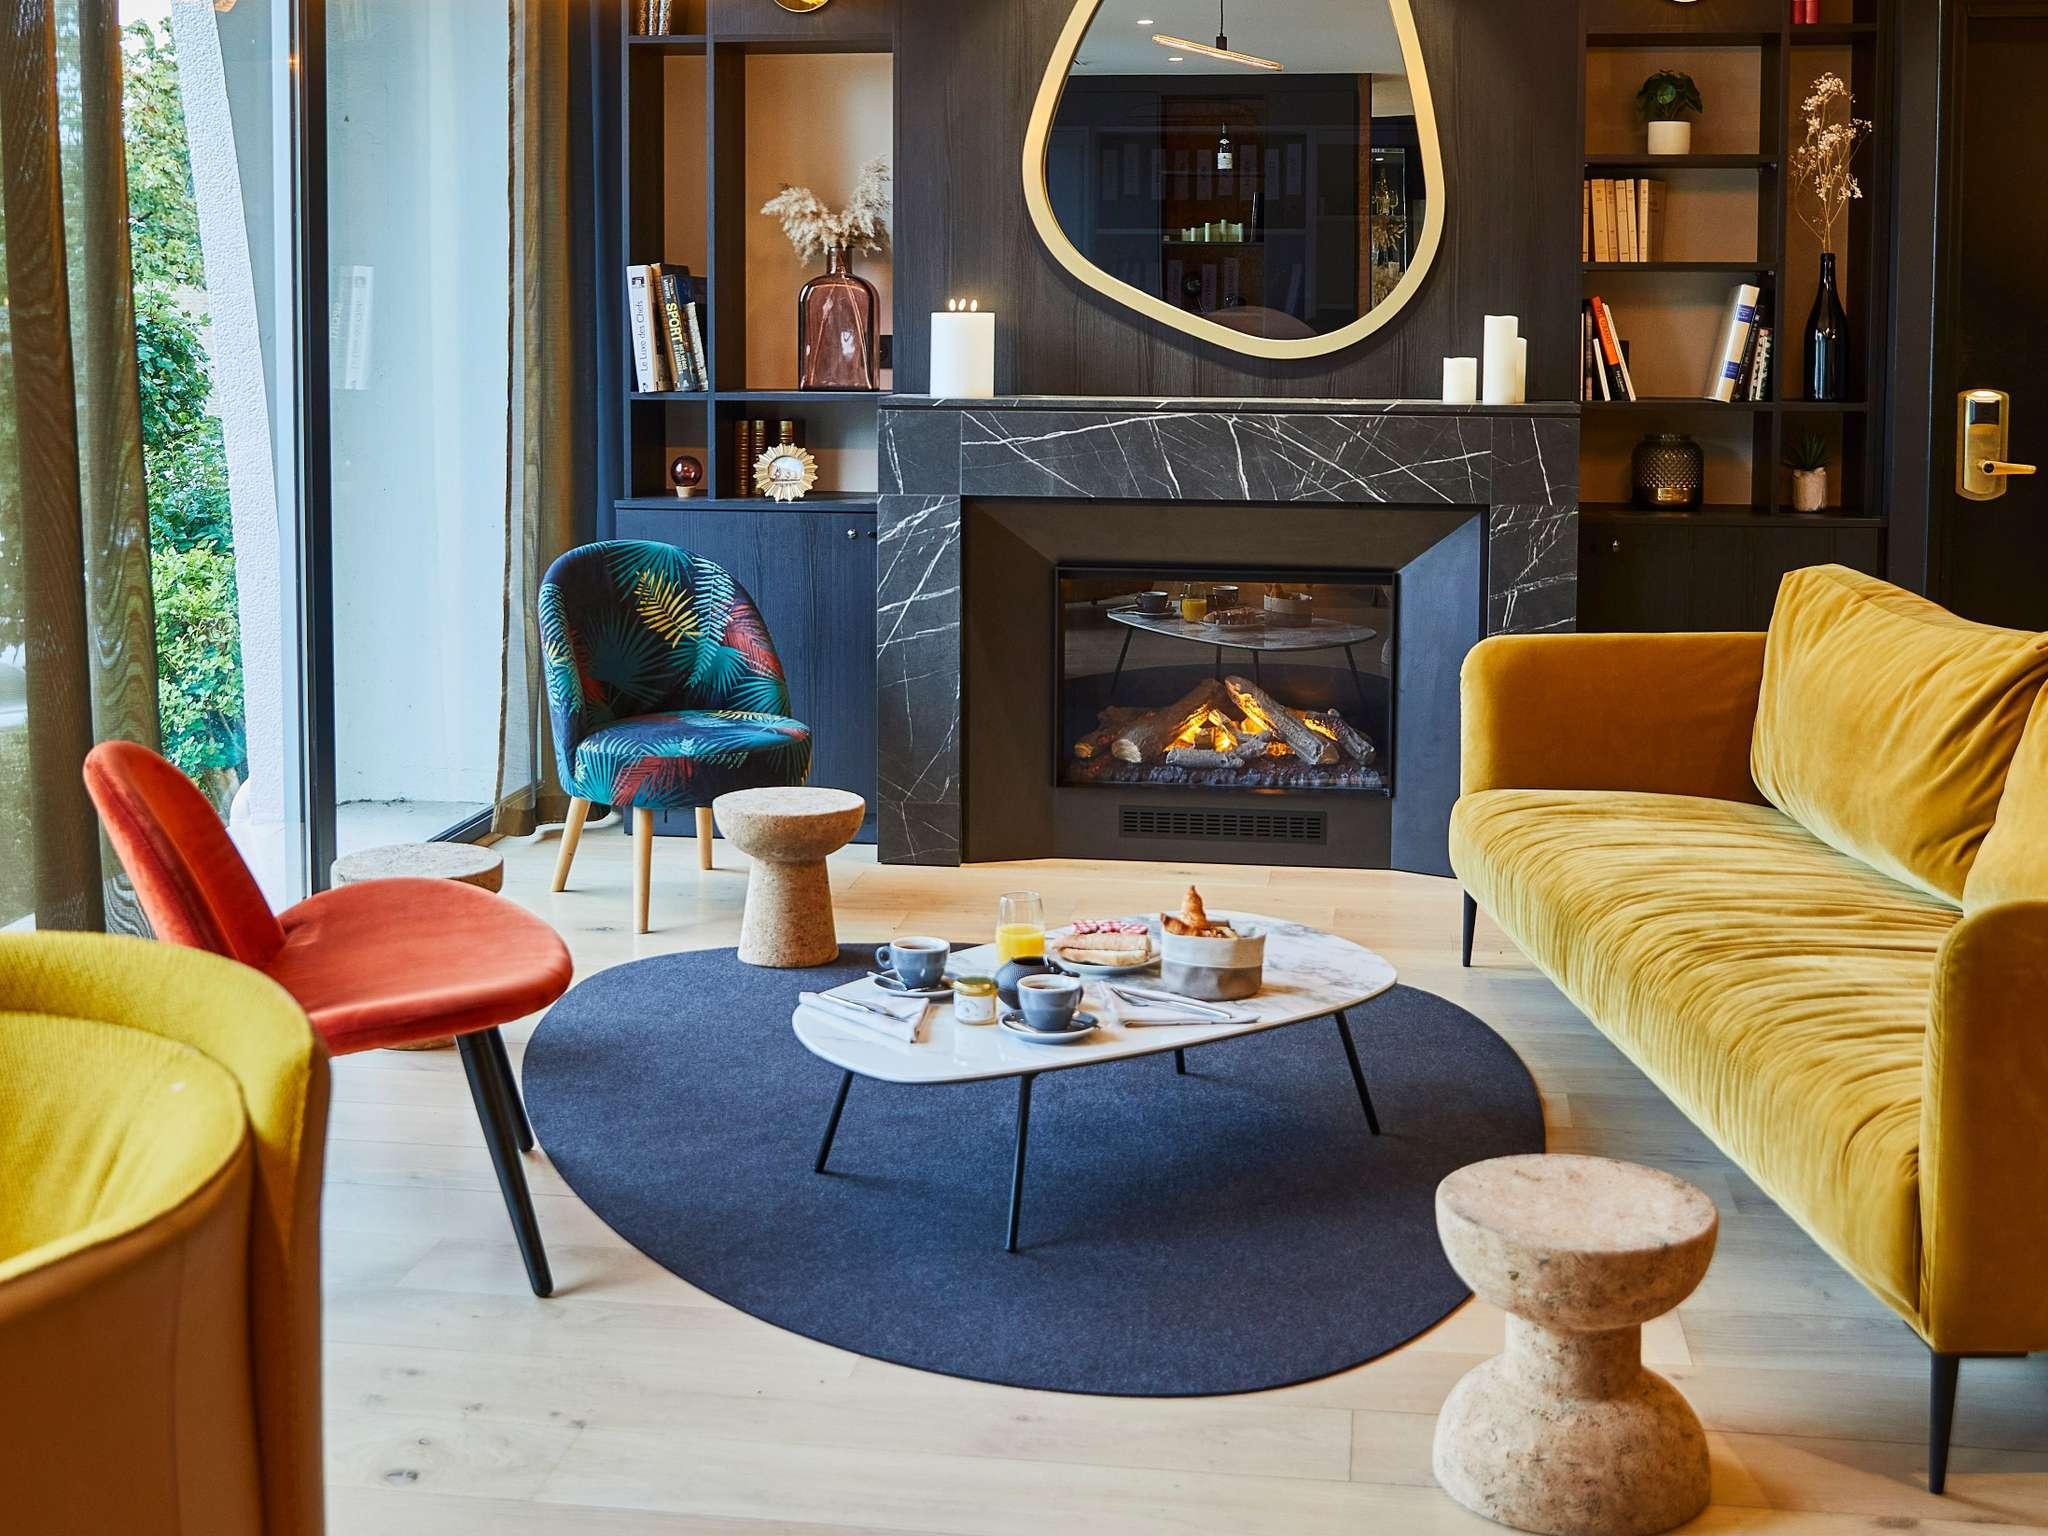 Hotel – Mercure Beaune Centre hotel